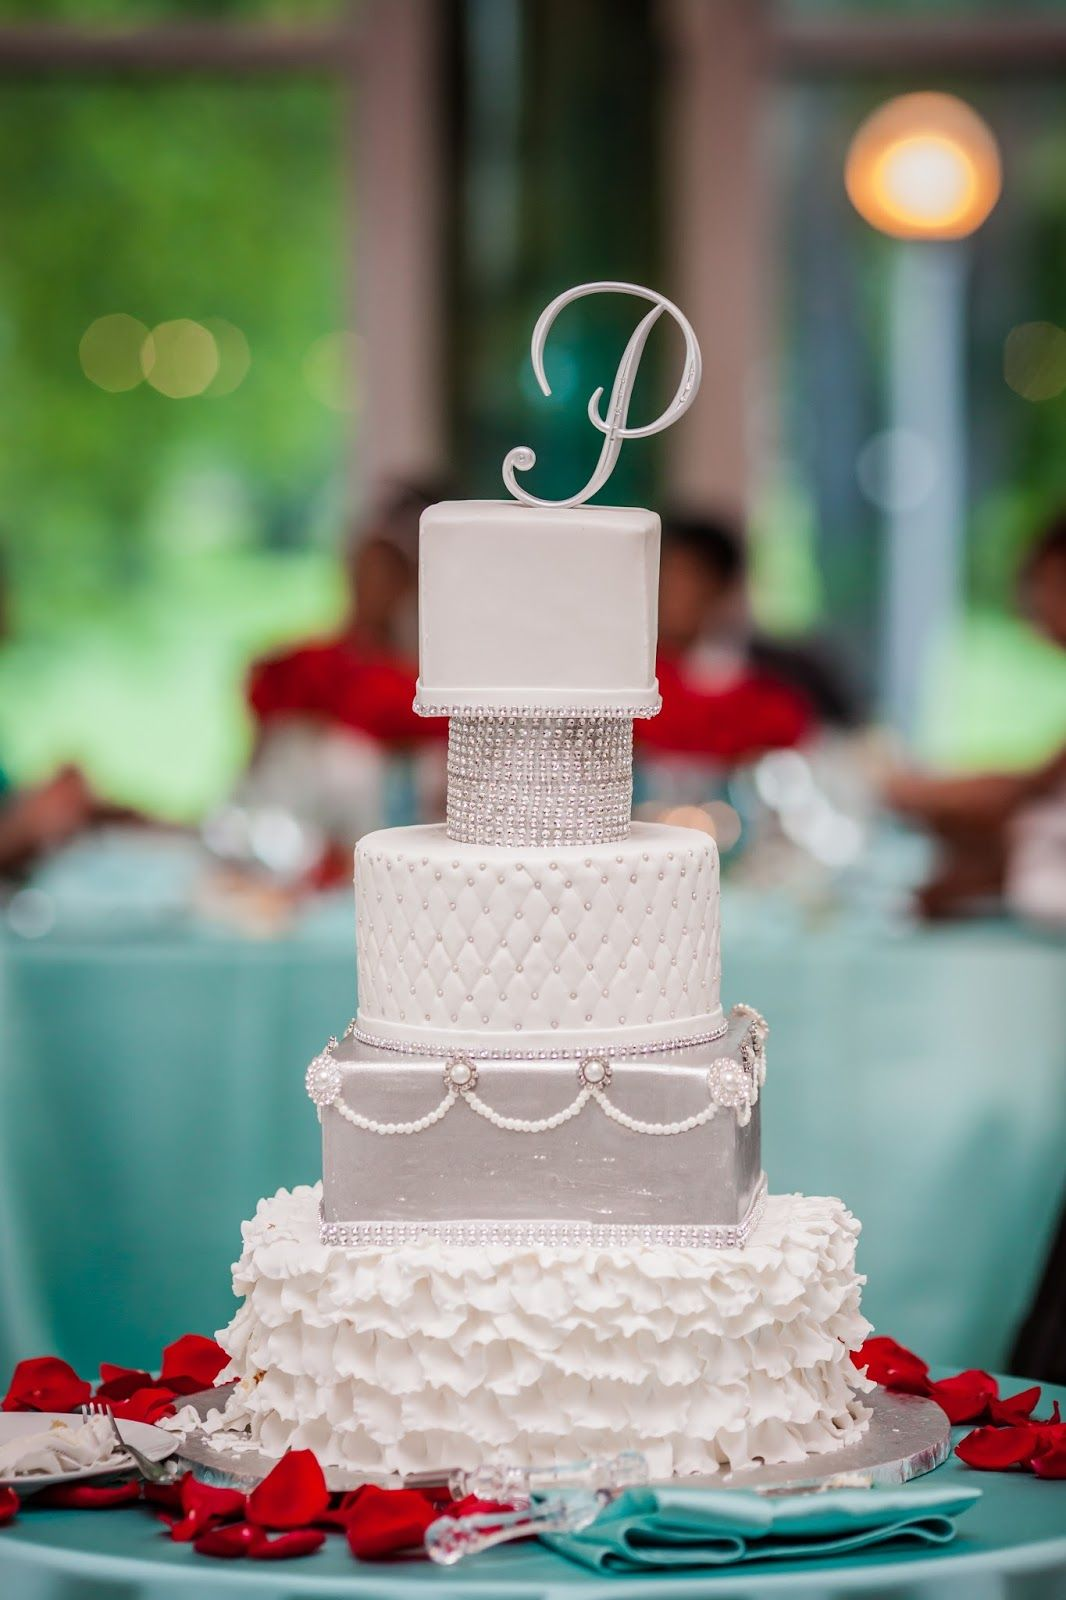 Pin by delish cakes inc on delish cakes wedding cakes pinterest